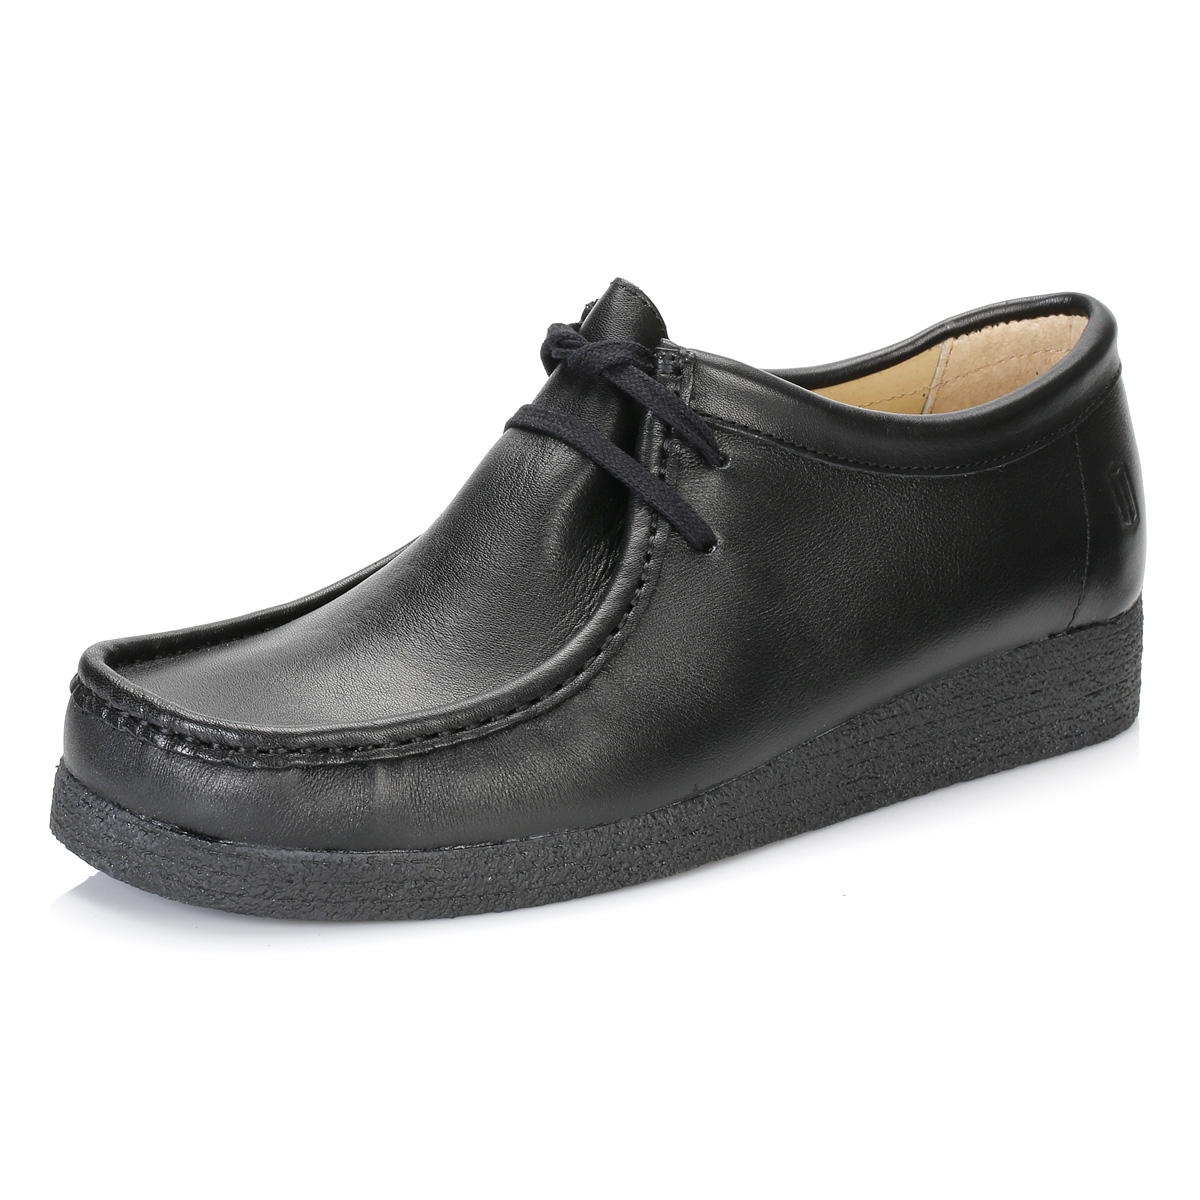 Wallaby Mens Shoes